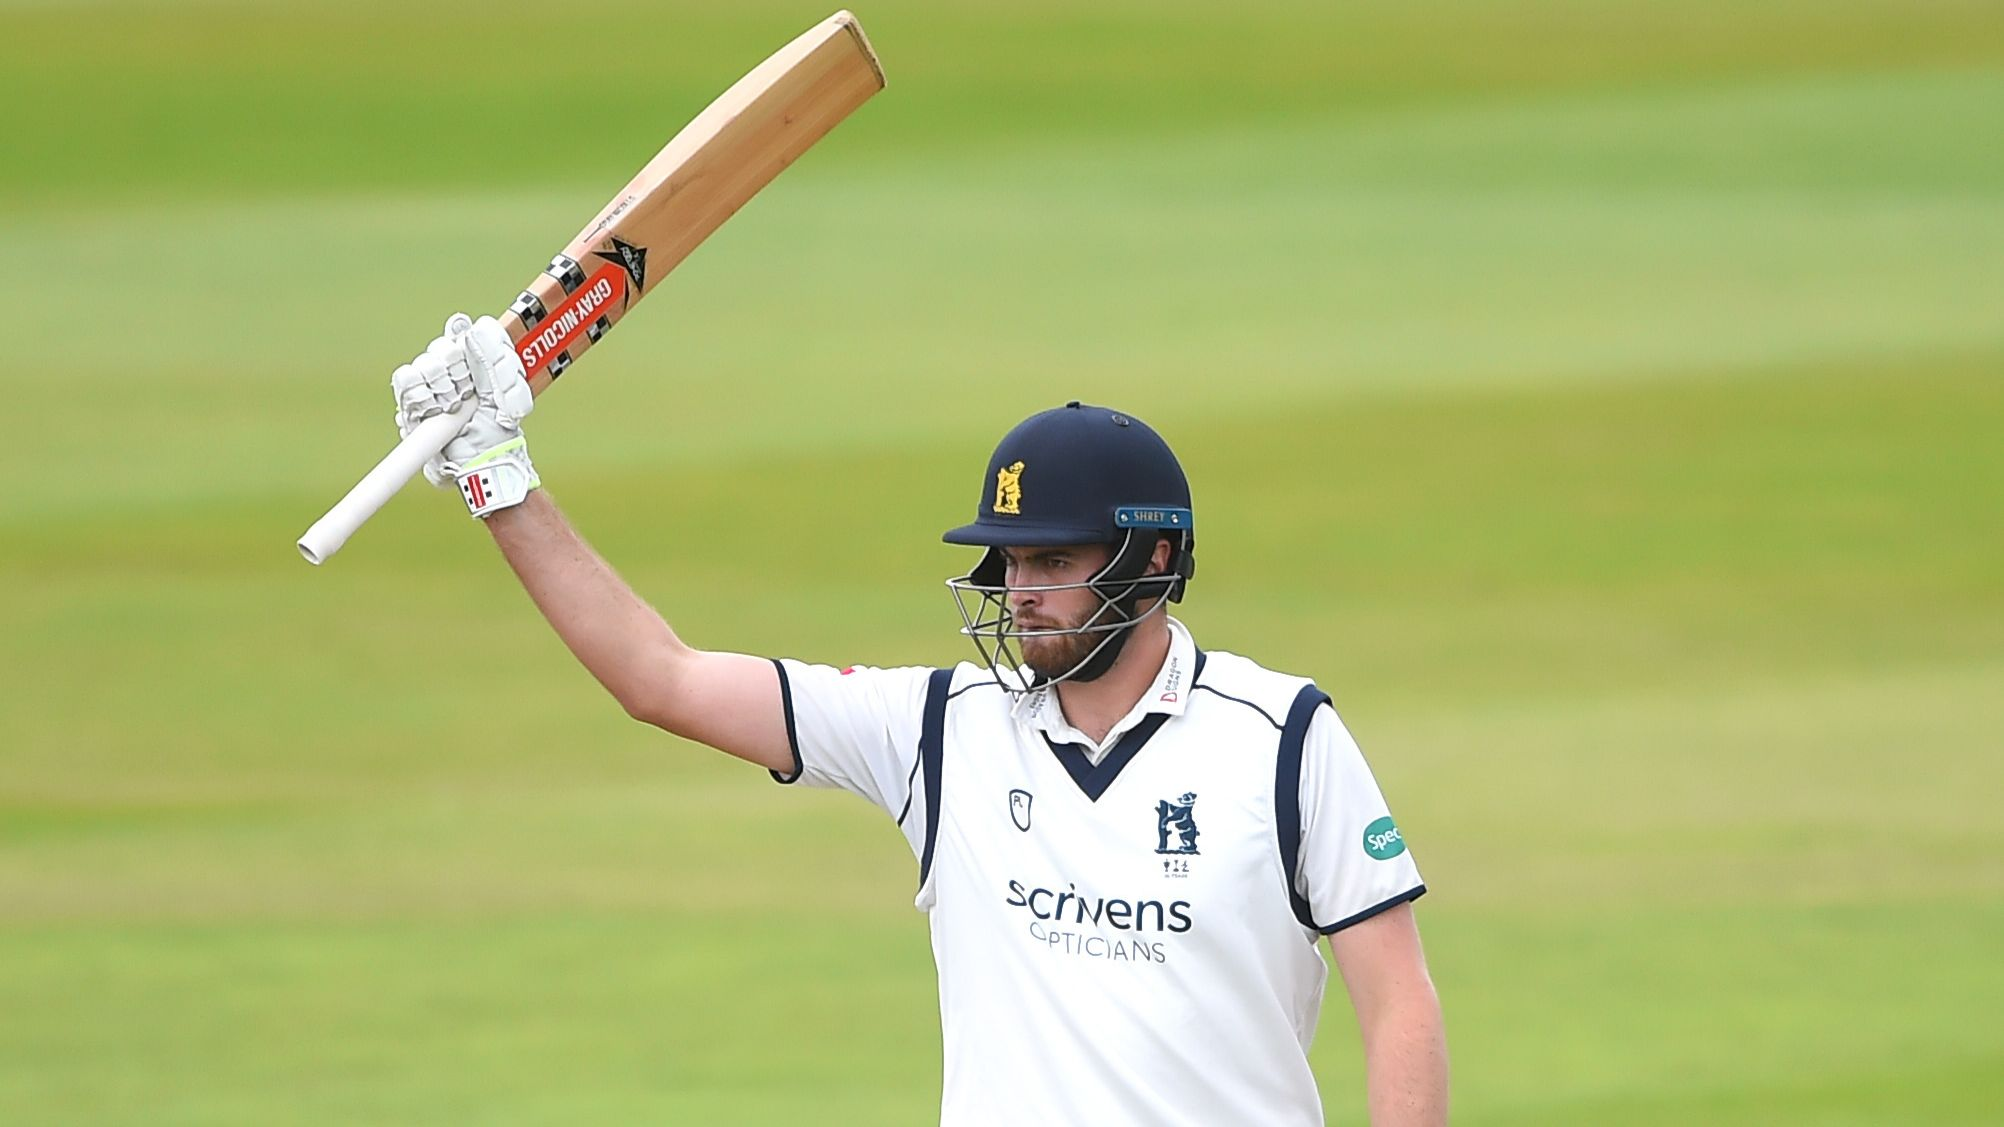 Cricket: Sibley key as Warwickshire look to add more runs